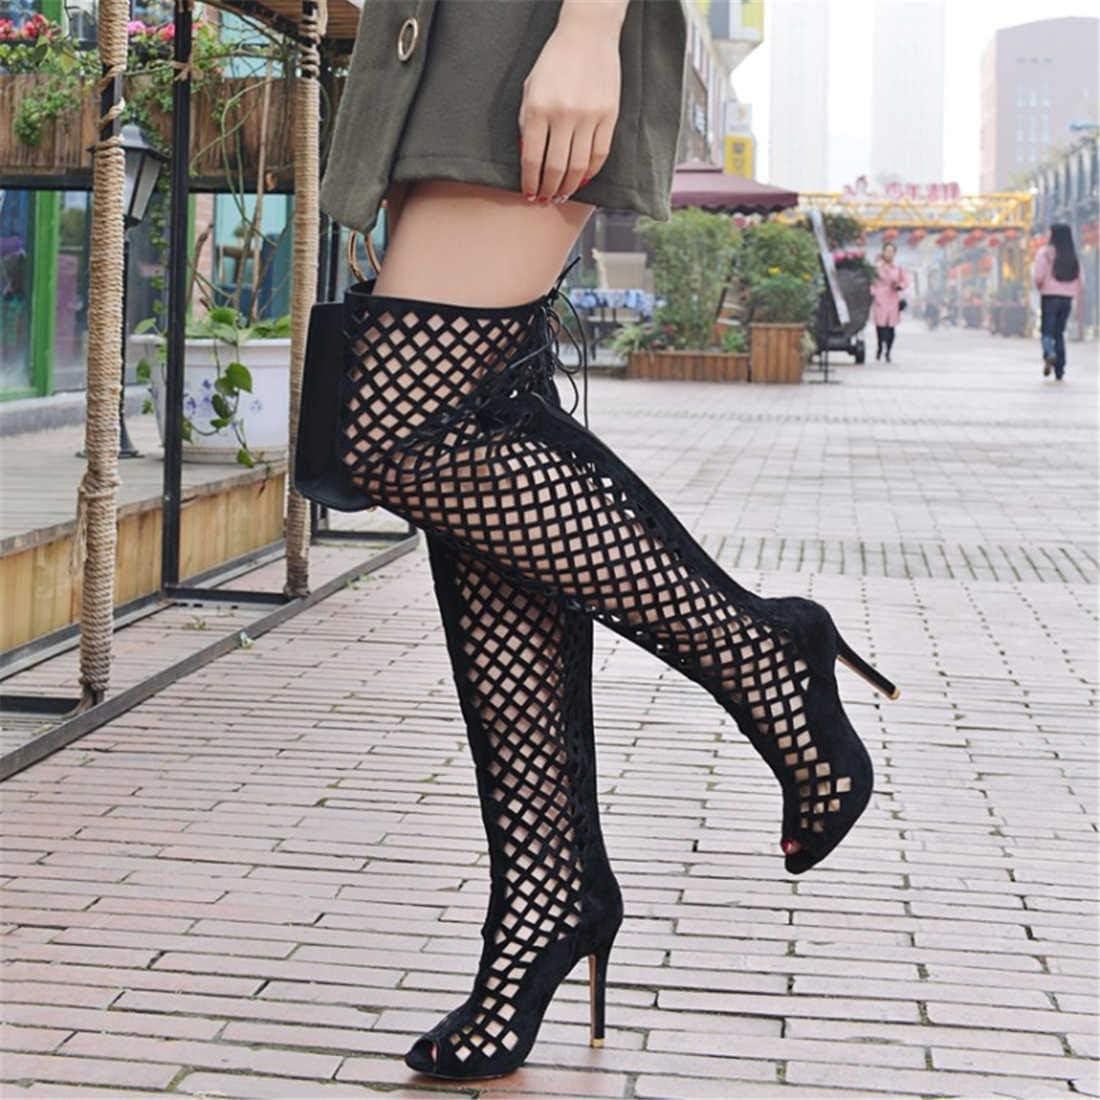 Cuissardes Femmes Net Fil Peep Toe Party Dress Chaussures 10CM Stiletto Mesh Grande Taille Chevalier Boot EU Taille 32-46 Black